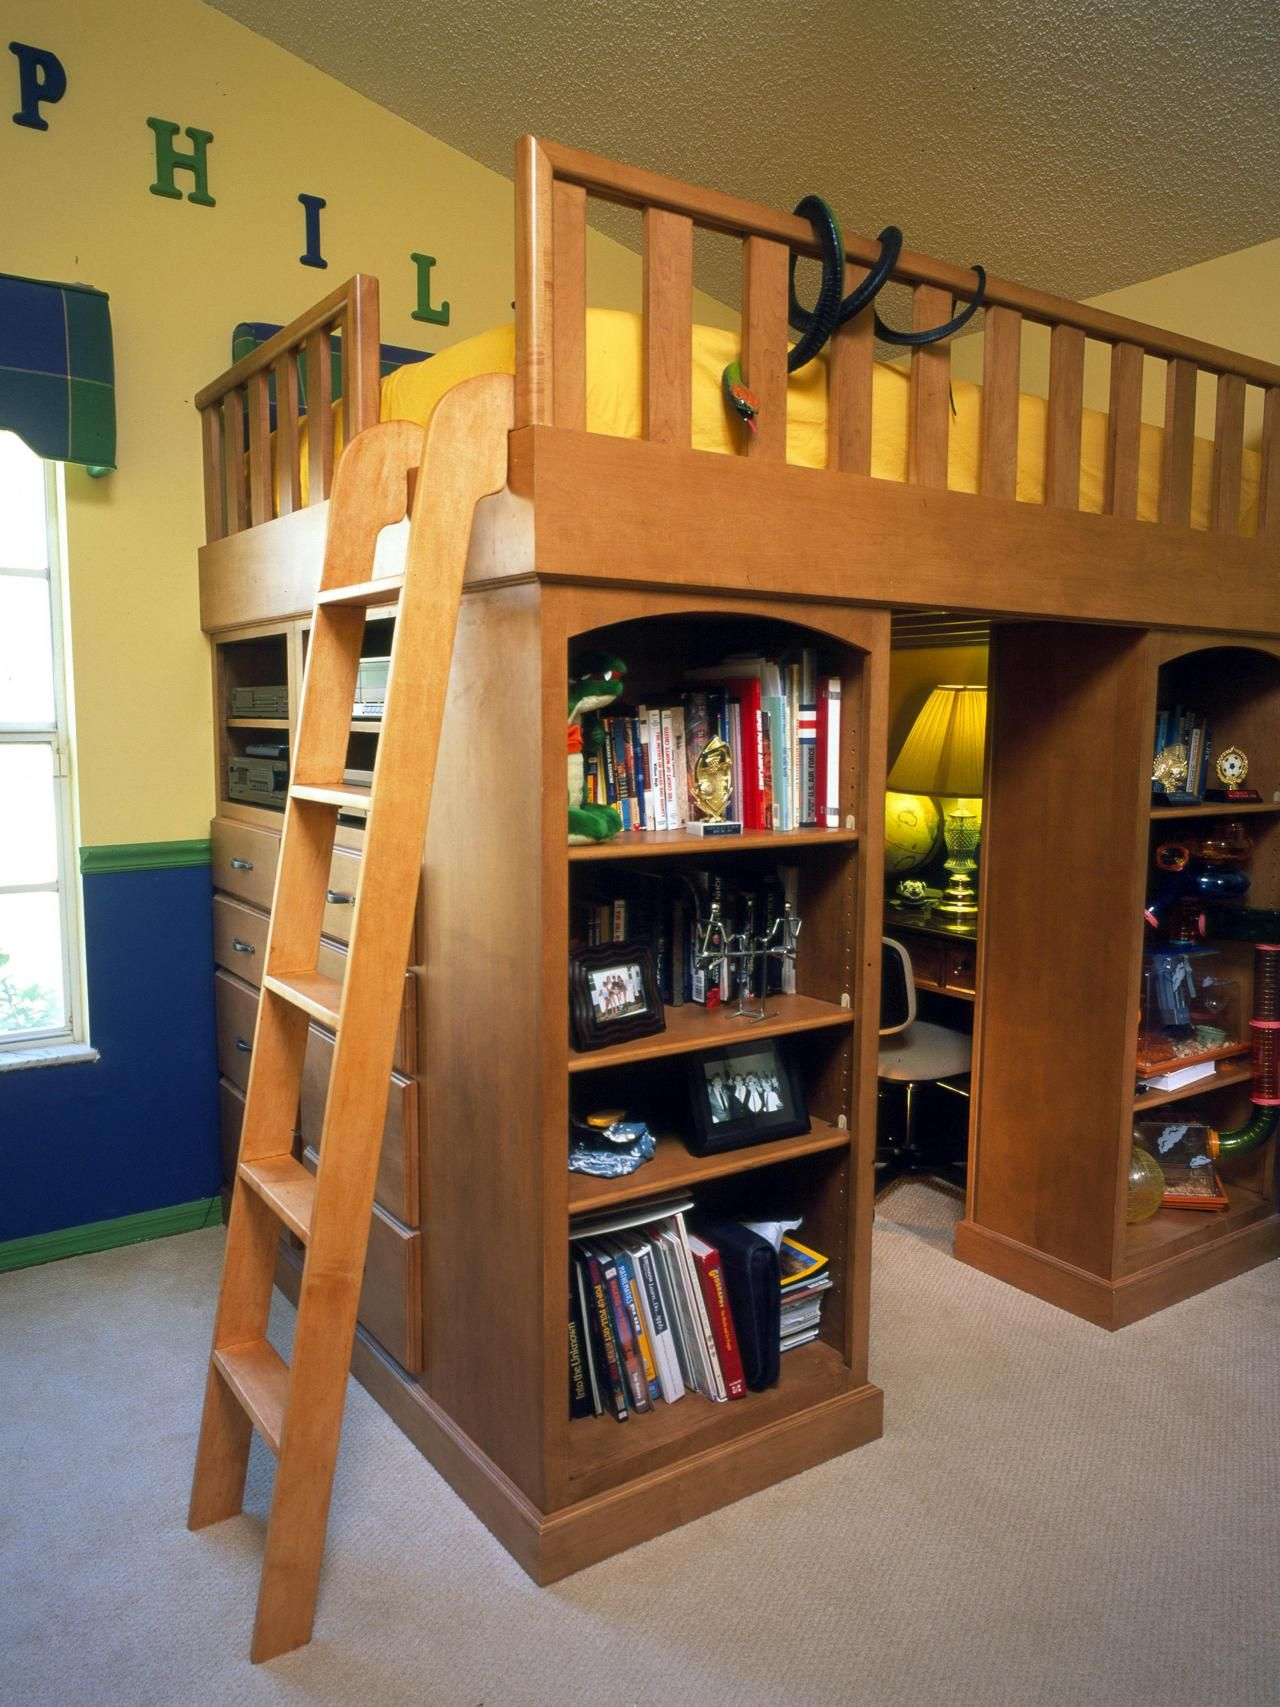 Organizing u storage tips for the pintsize set kids rooms hgtv